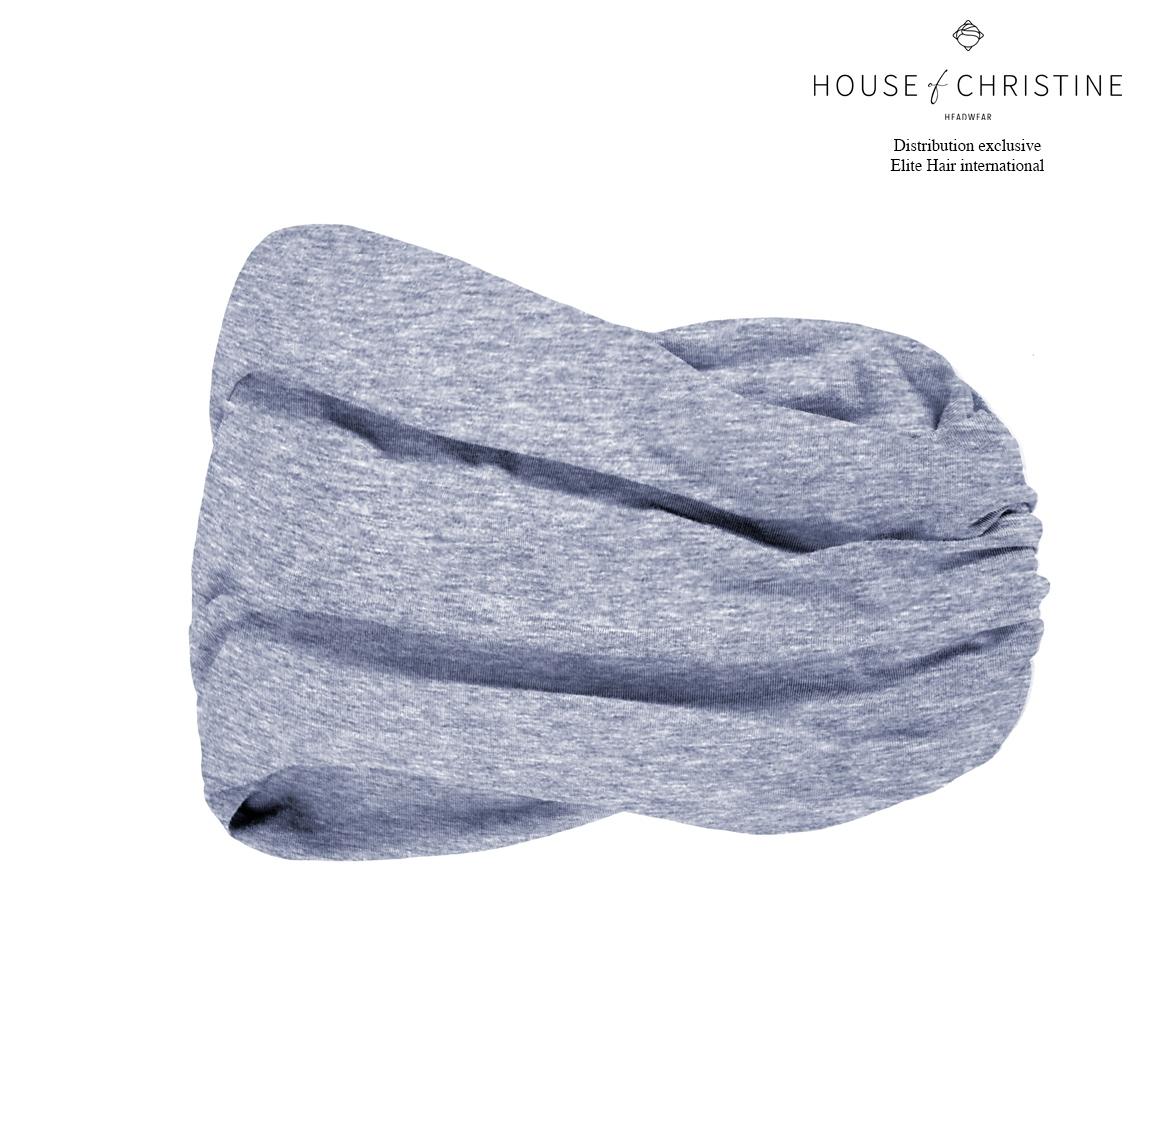 Bandeau chimio karma, rêve bleu, christine headwear